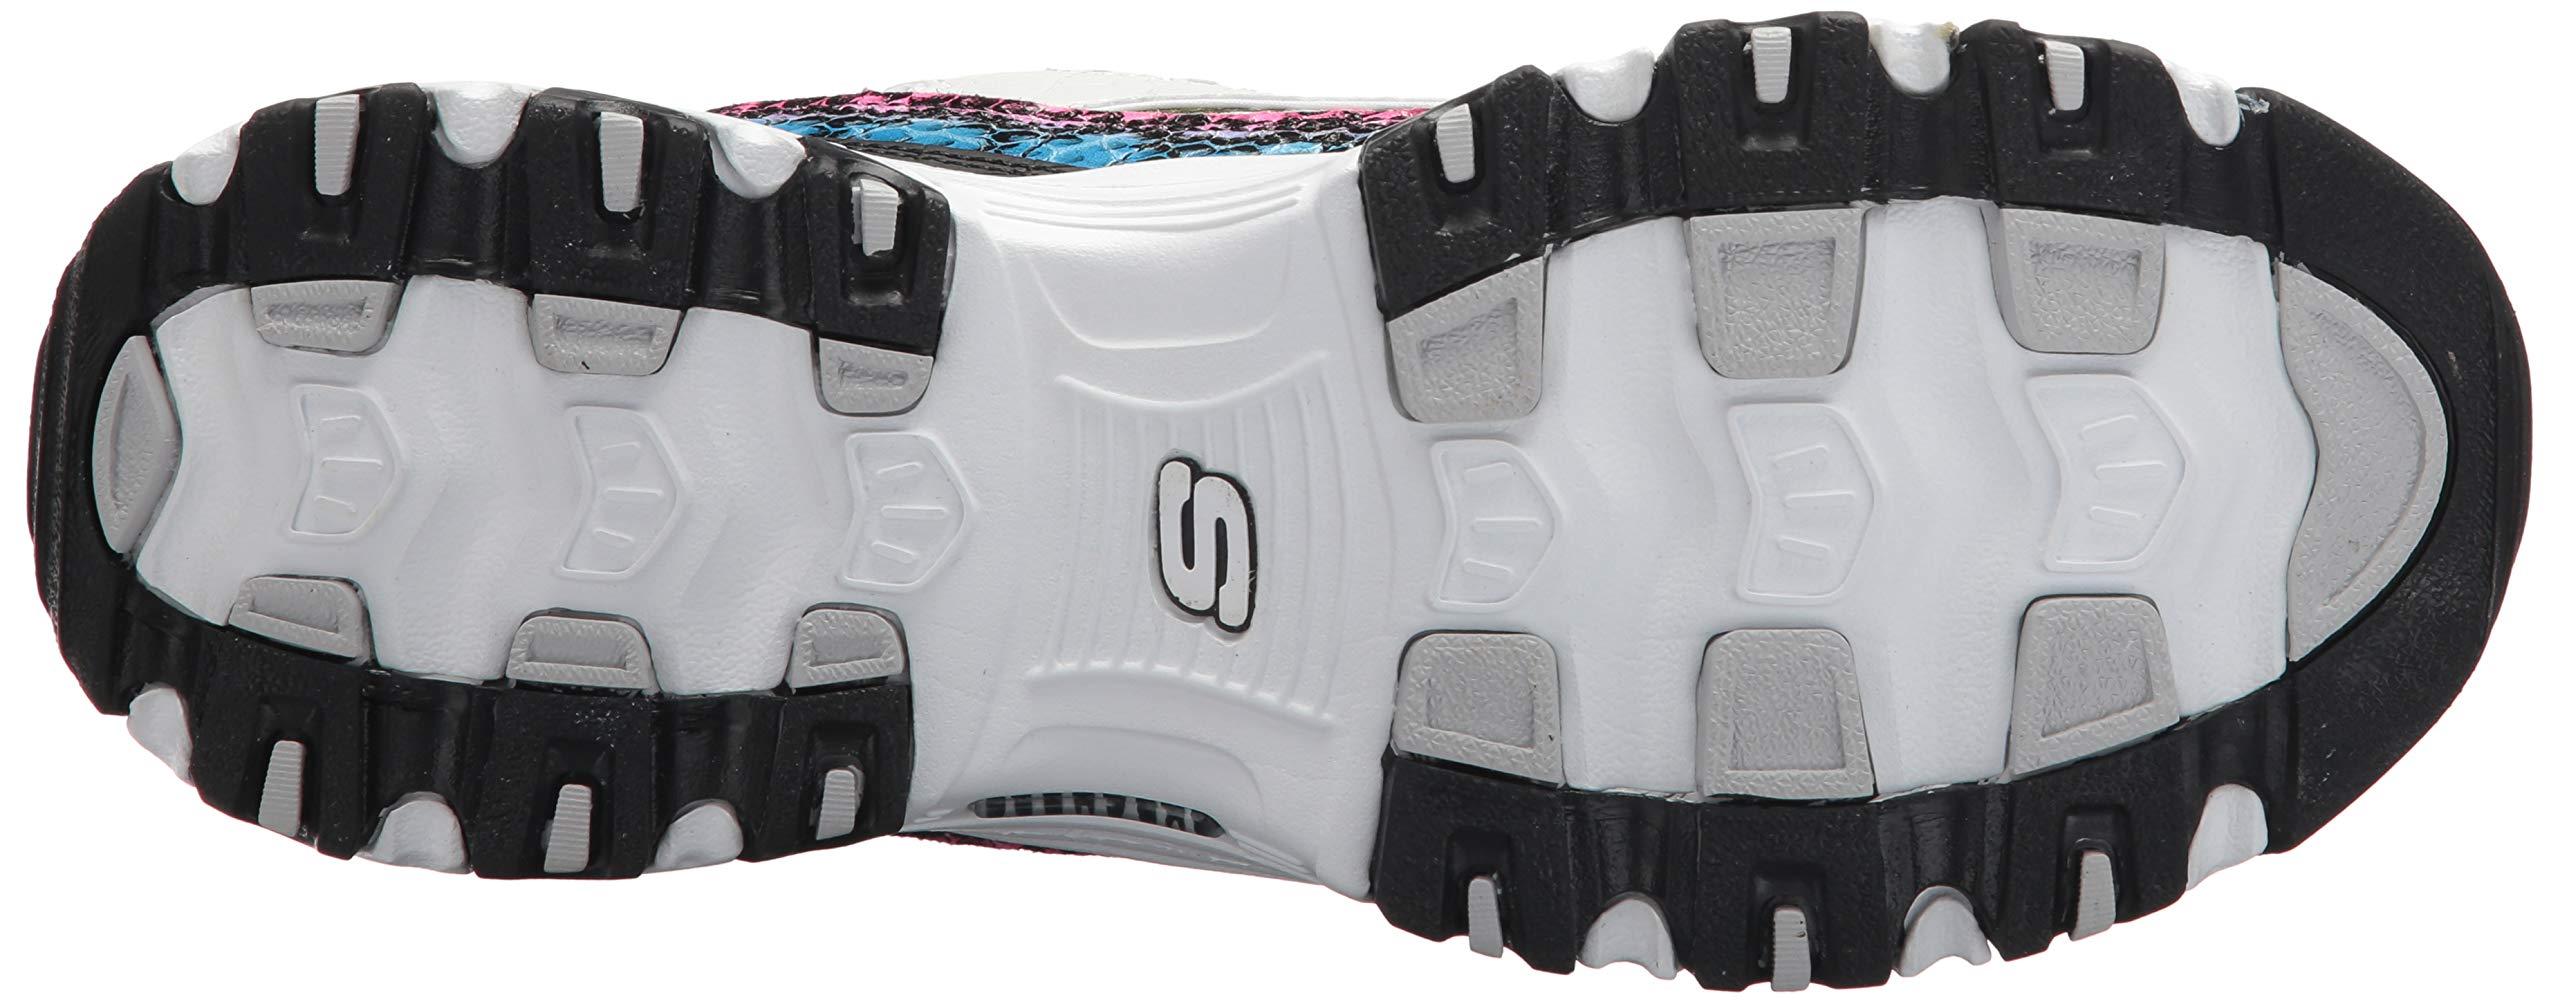 Zapatillas Skechers D'Lites-Runway Ready para mujer